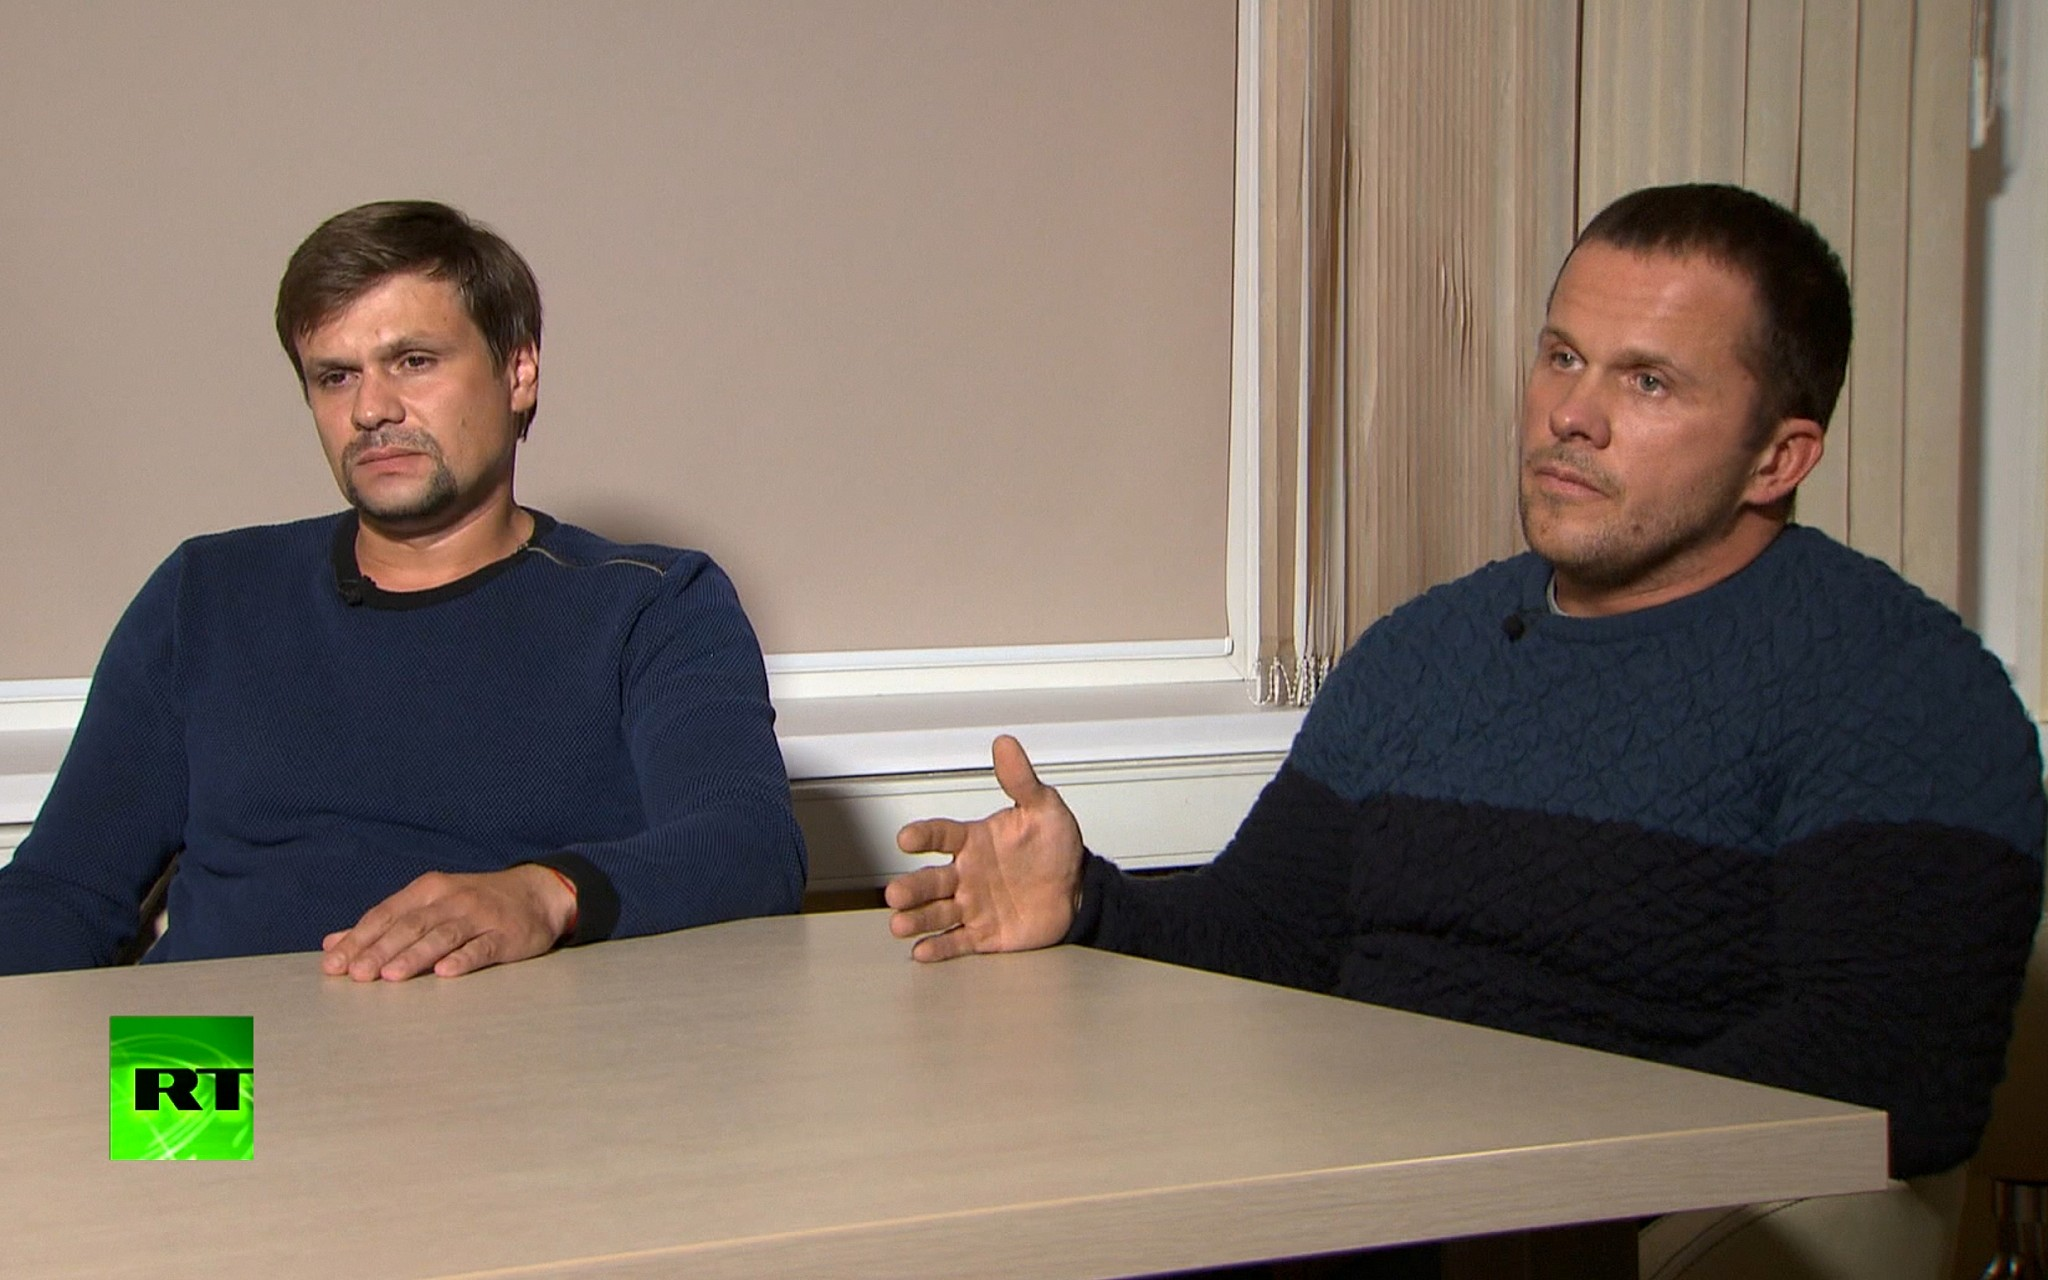 Petrov, Boshirov, Colonel Chepiga. And who do you actually believe 30